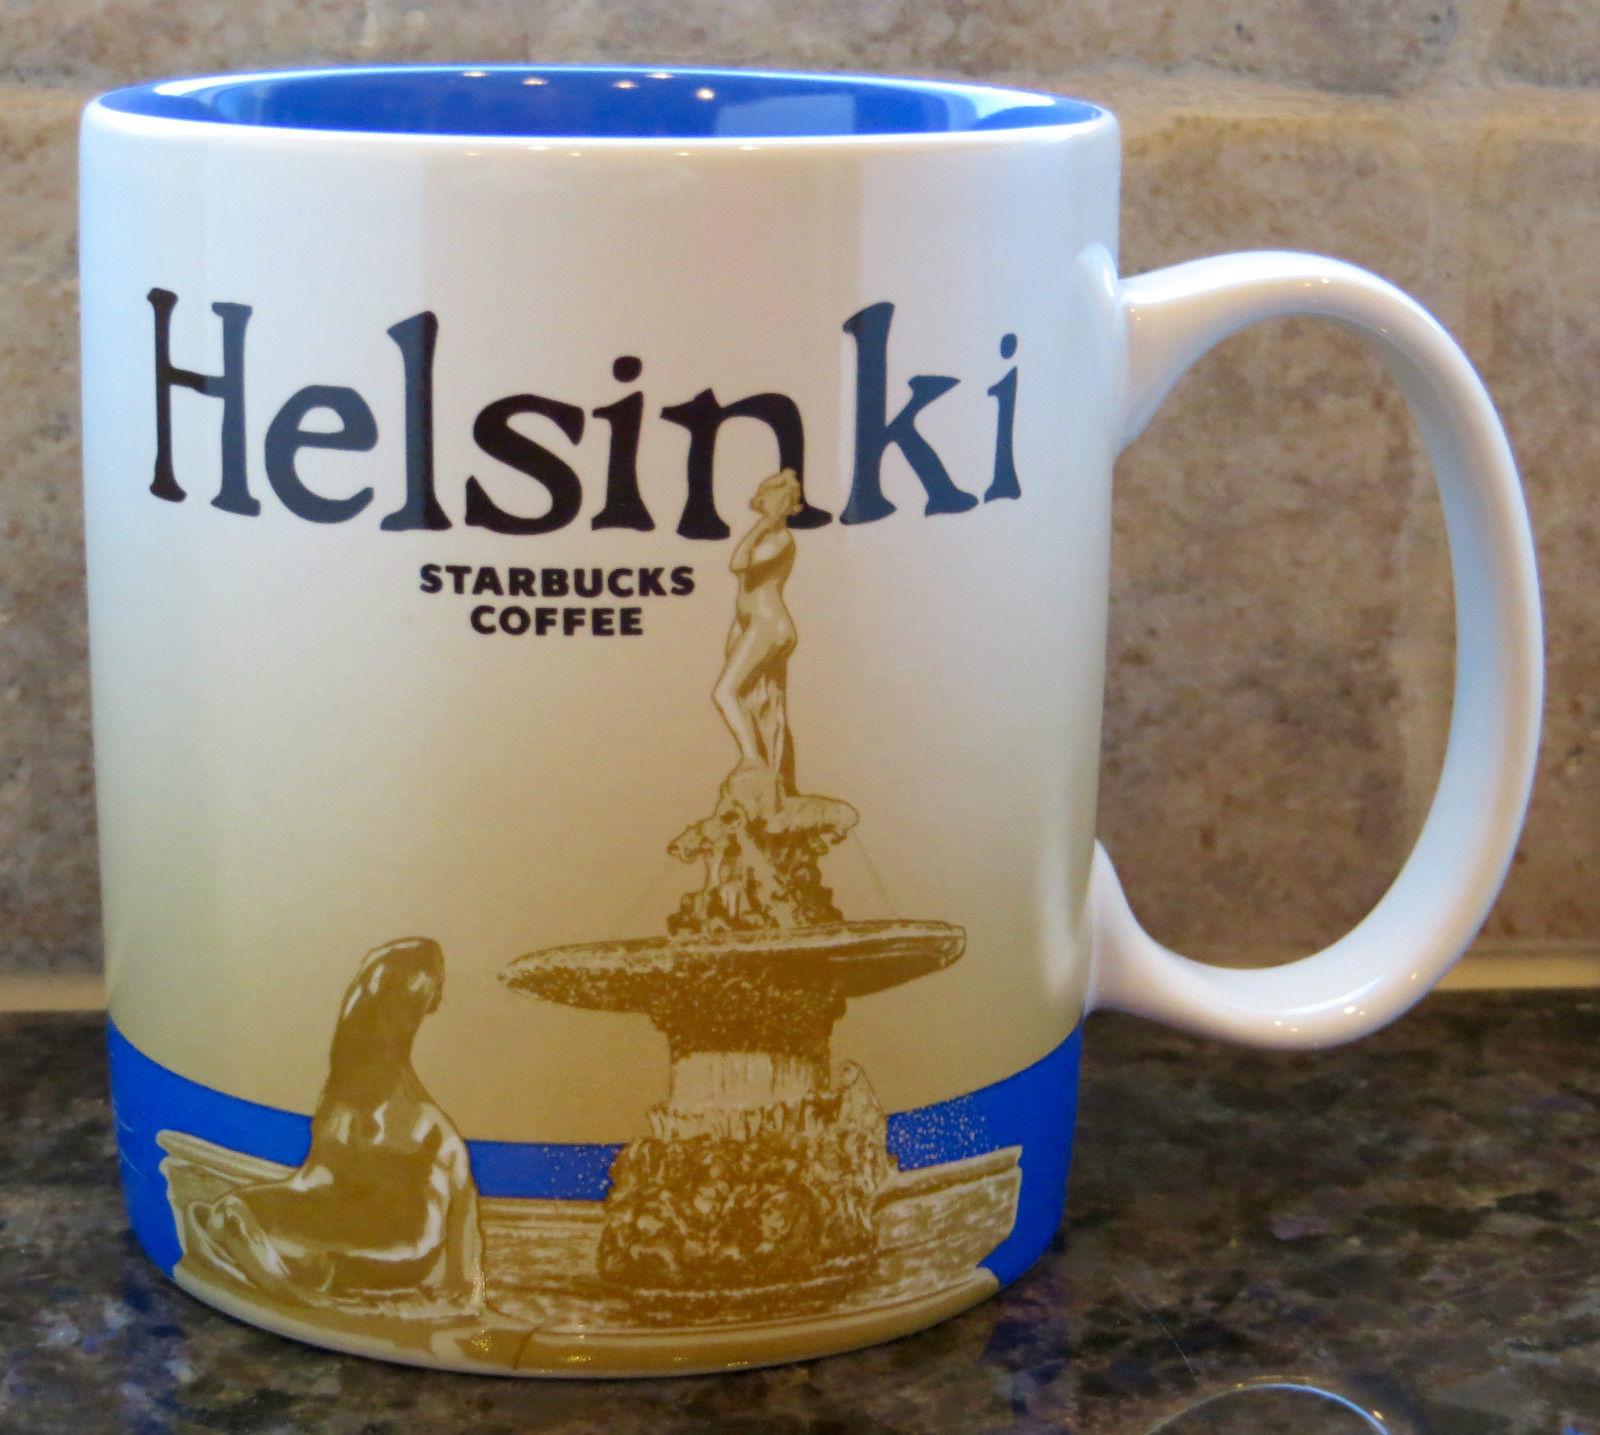 Starbucks Finland